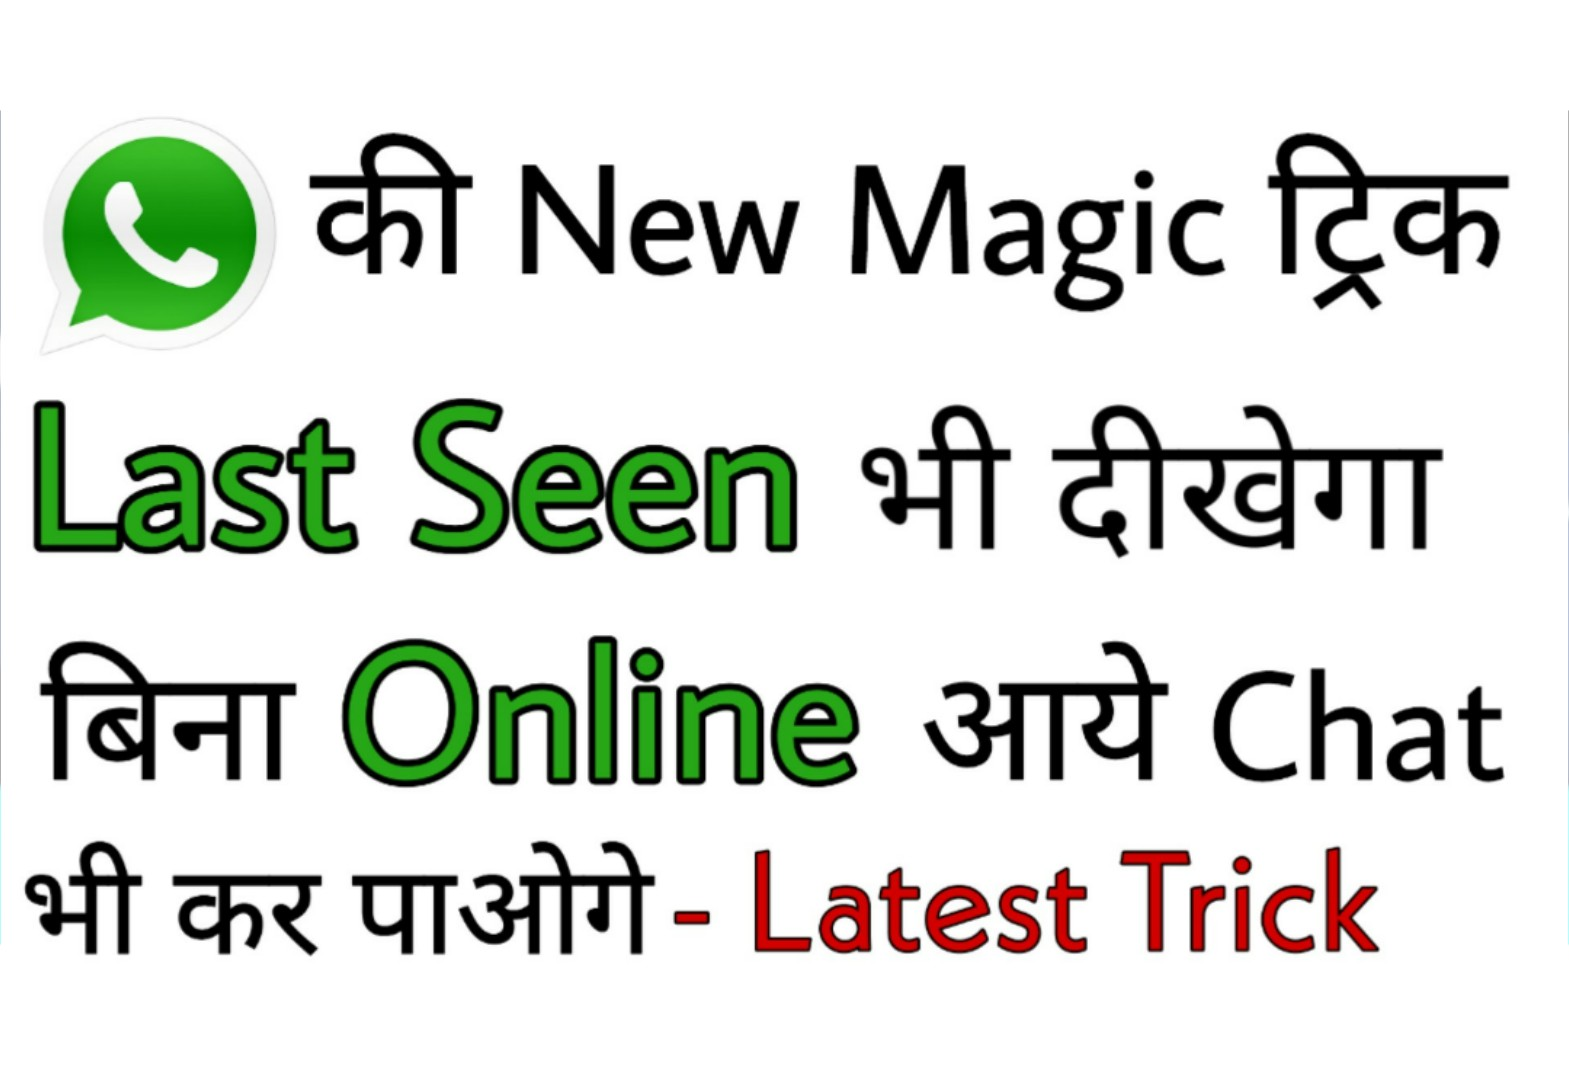 Whatsapp Par Bina Online Aaye Chat Kaise Kare?